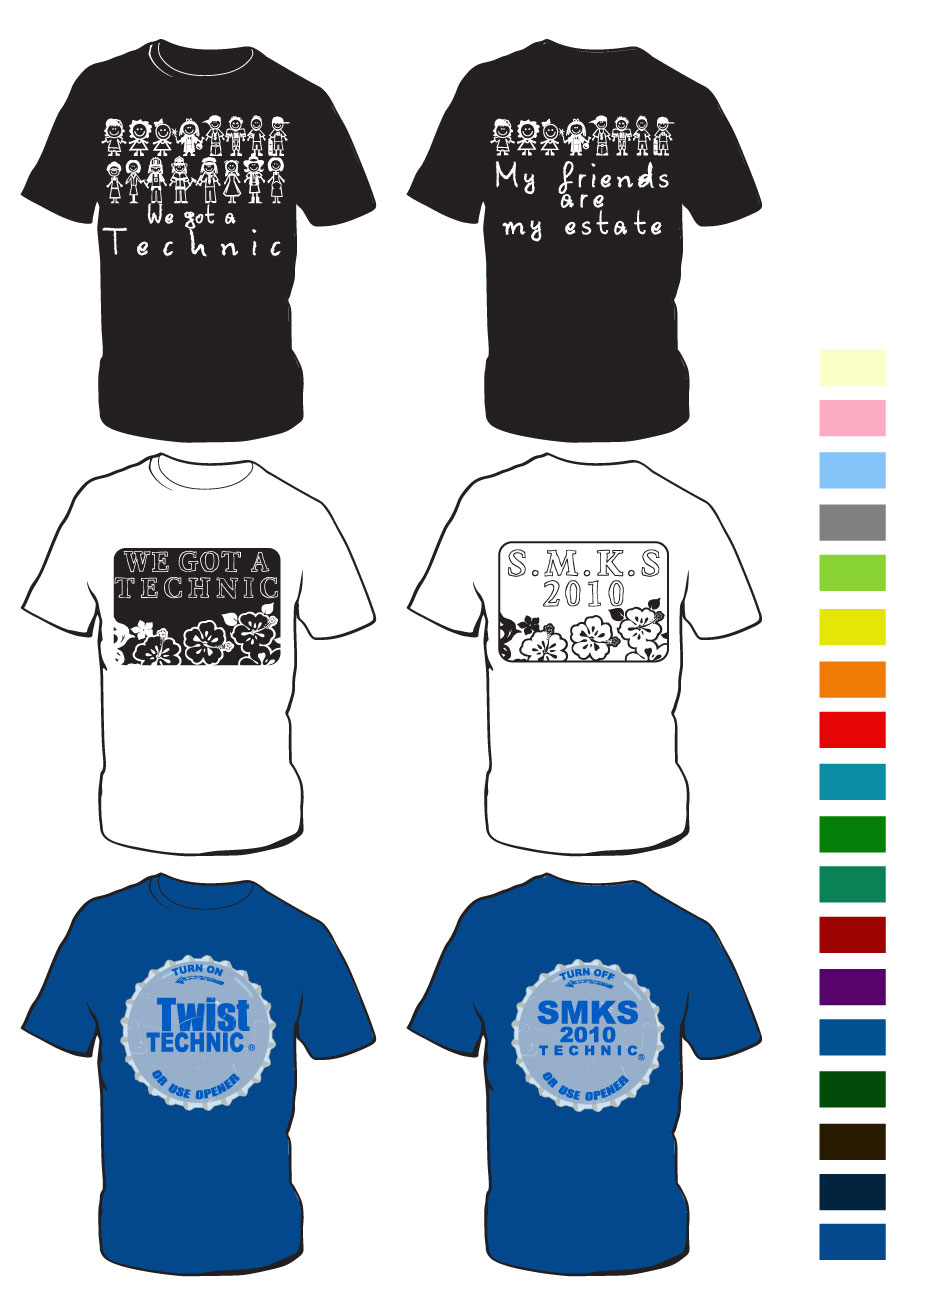 Contoh design tshirt kelas - Contoh Design Tshirt Kelas 34